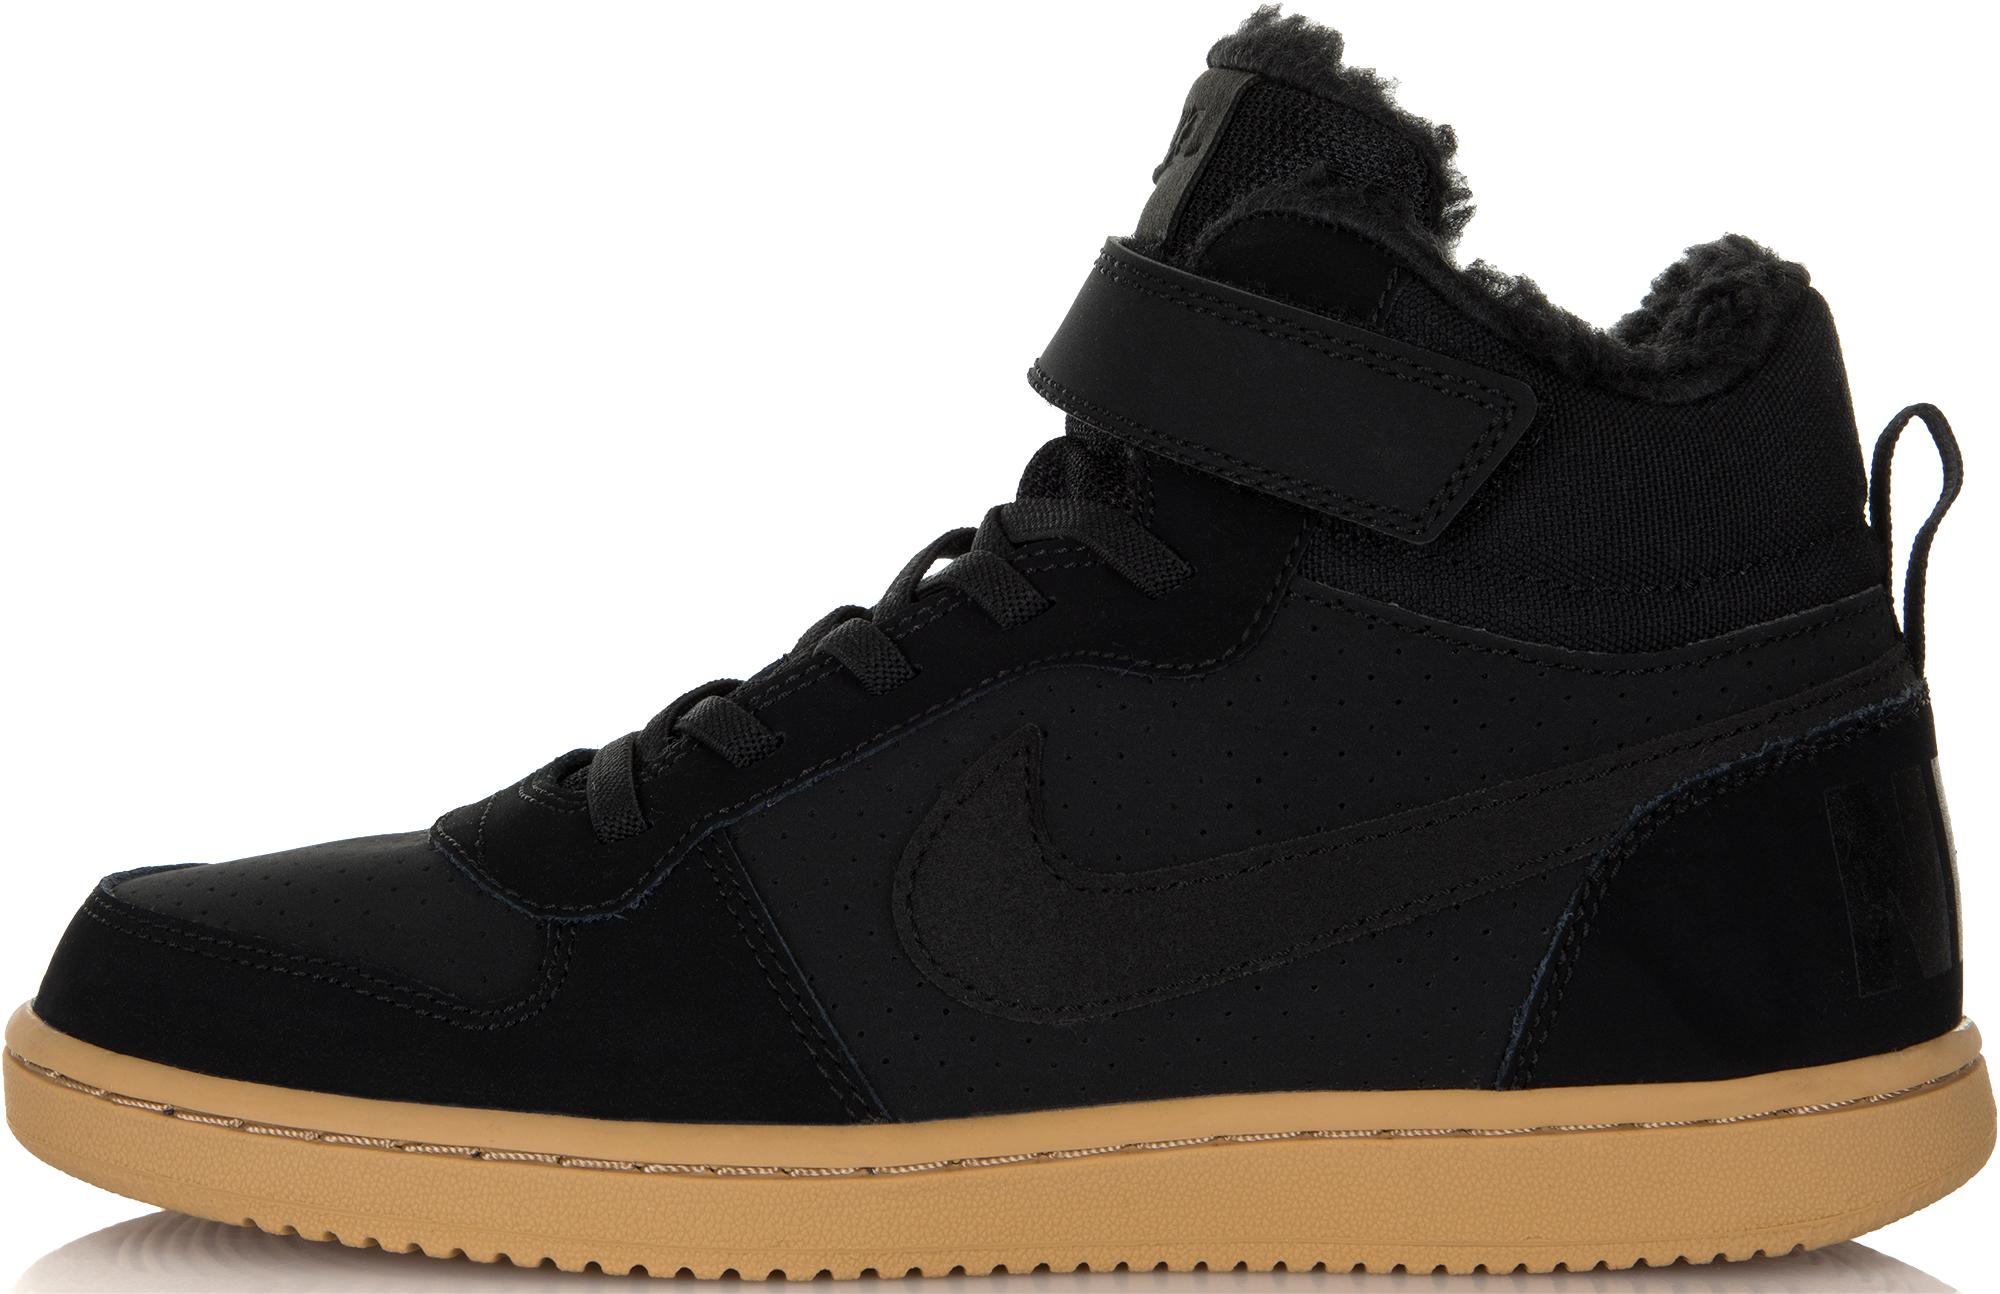 Nike Кеды для мальчиков Nike Court Borough Mid (PS), размер 34 цена